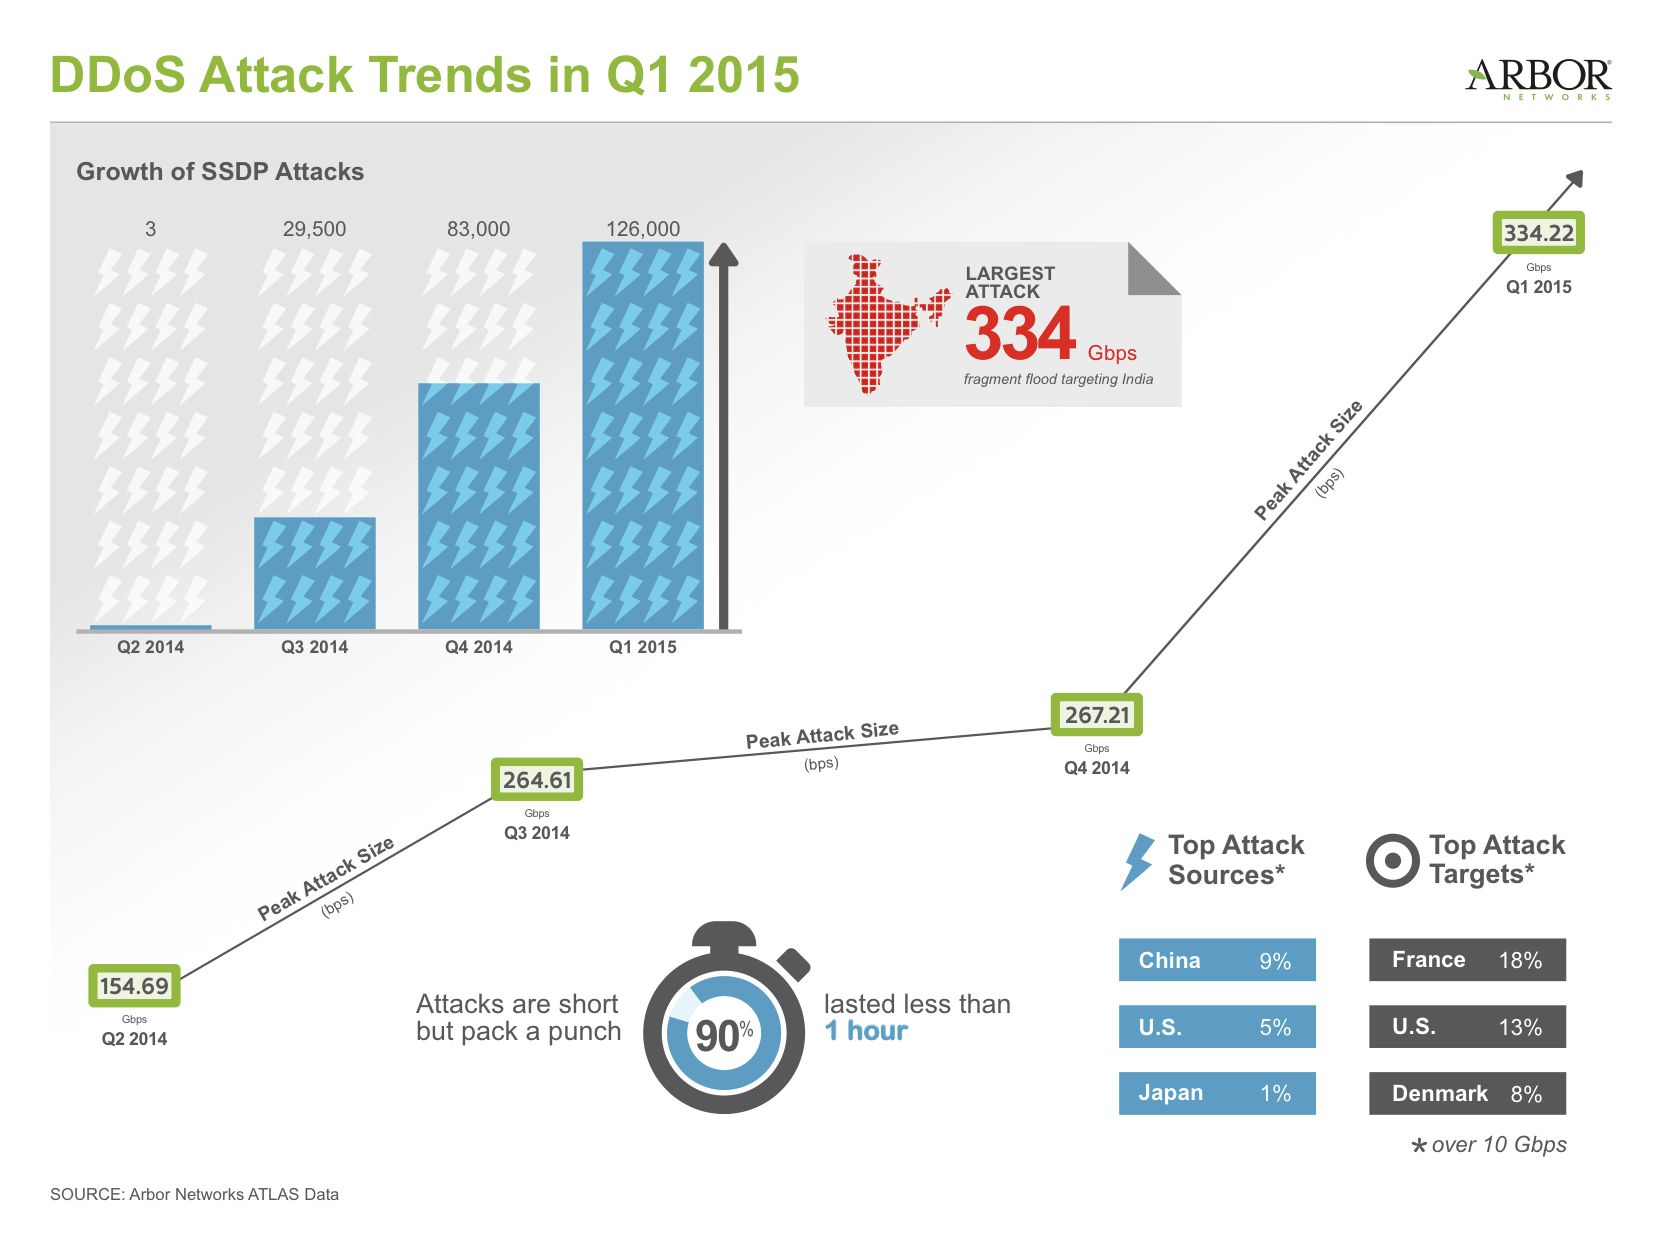 ATLAS Q1 2015 DDoS Attack Trends (Source: Arbor Networks ...